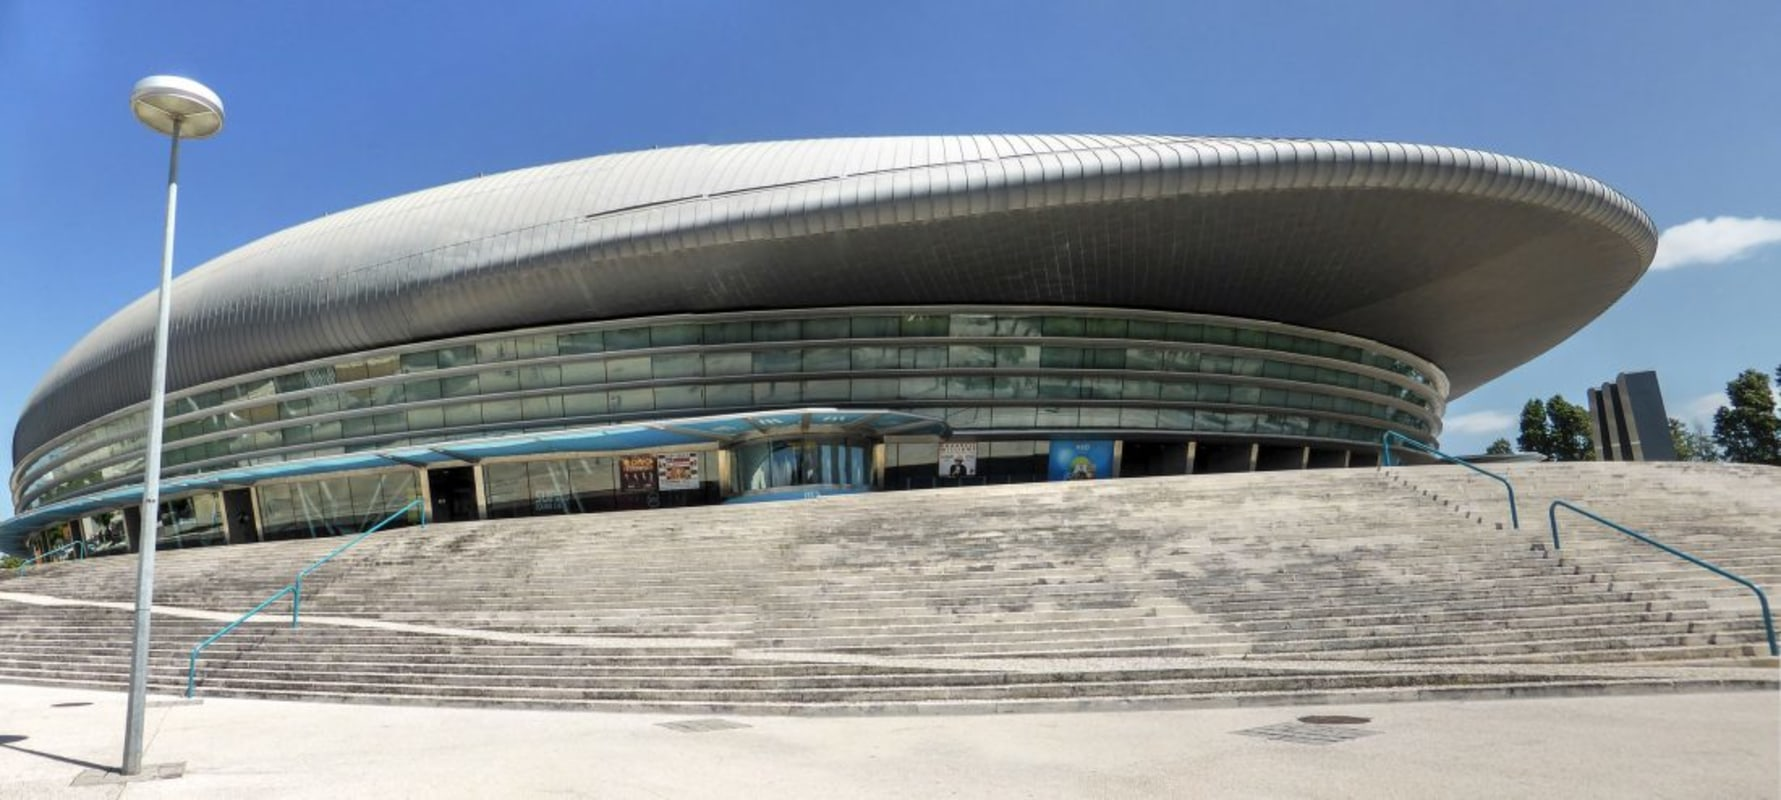 Utopian Pavilion / MEO Arena